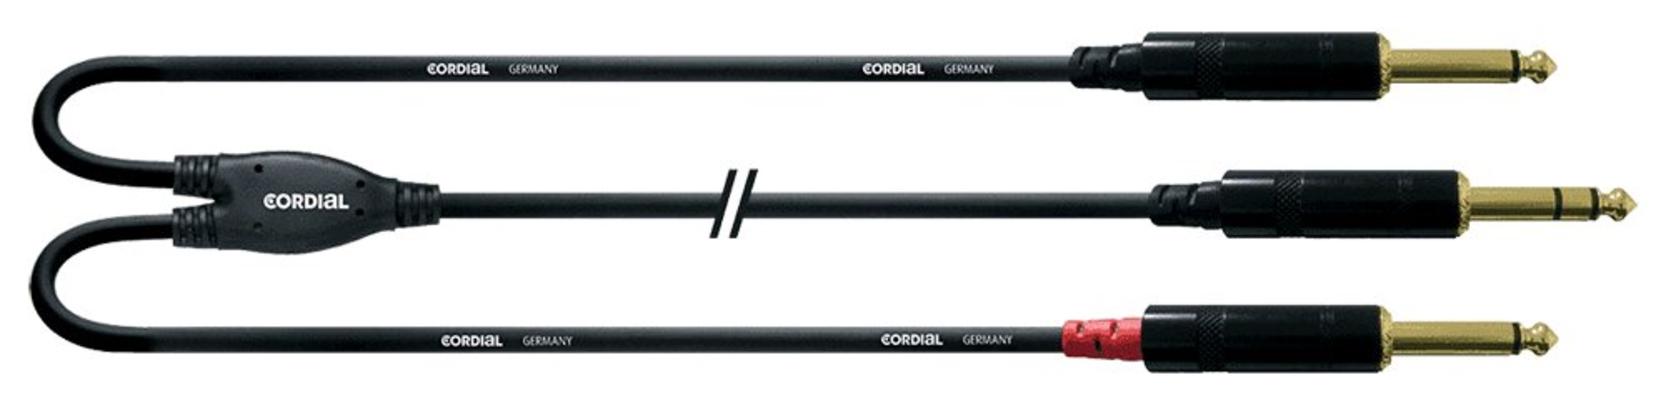 Cordial CFY 0.9 VPP Jack stereo 6.3mm  2x Jack mono 6.3mm 0.9m